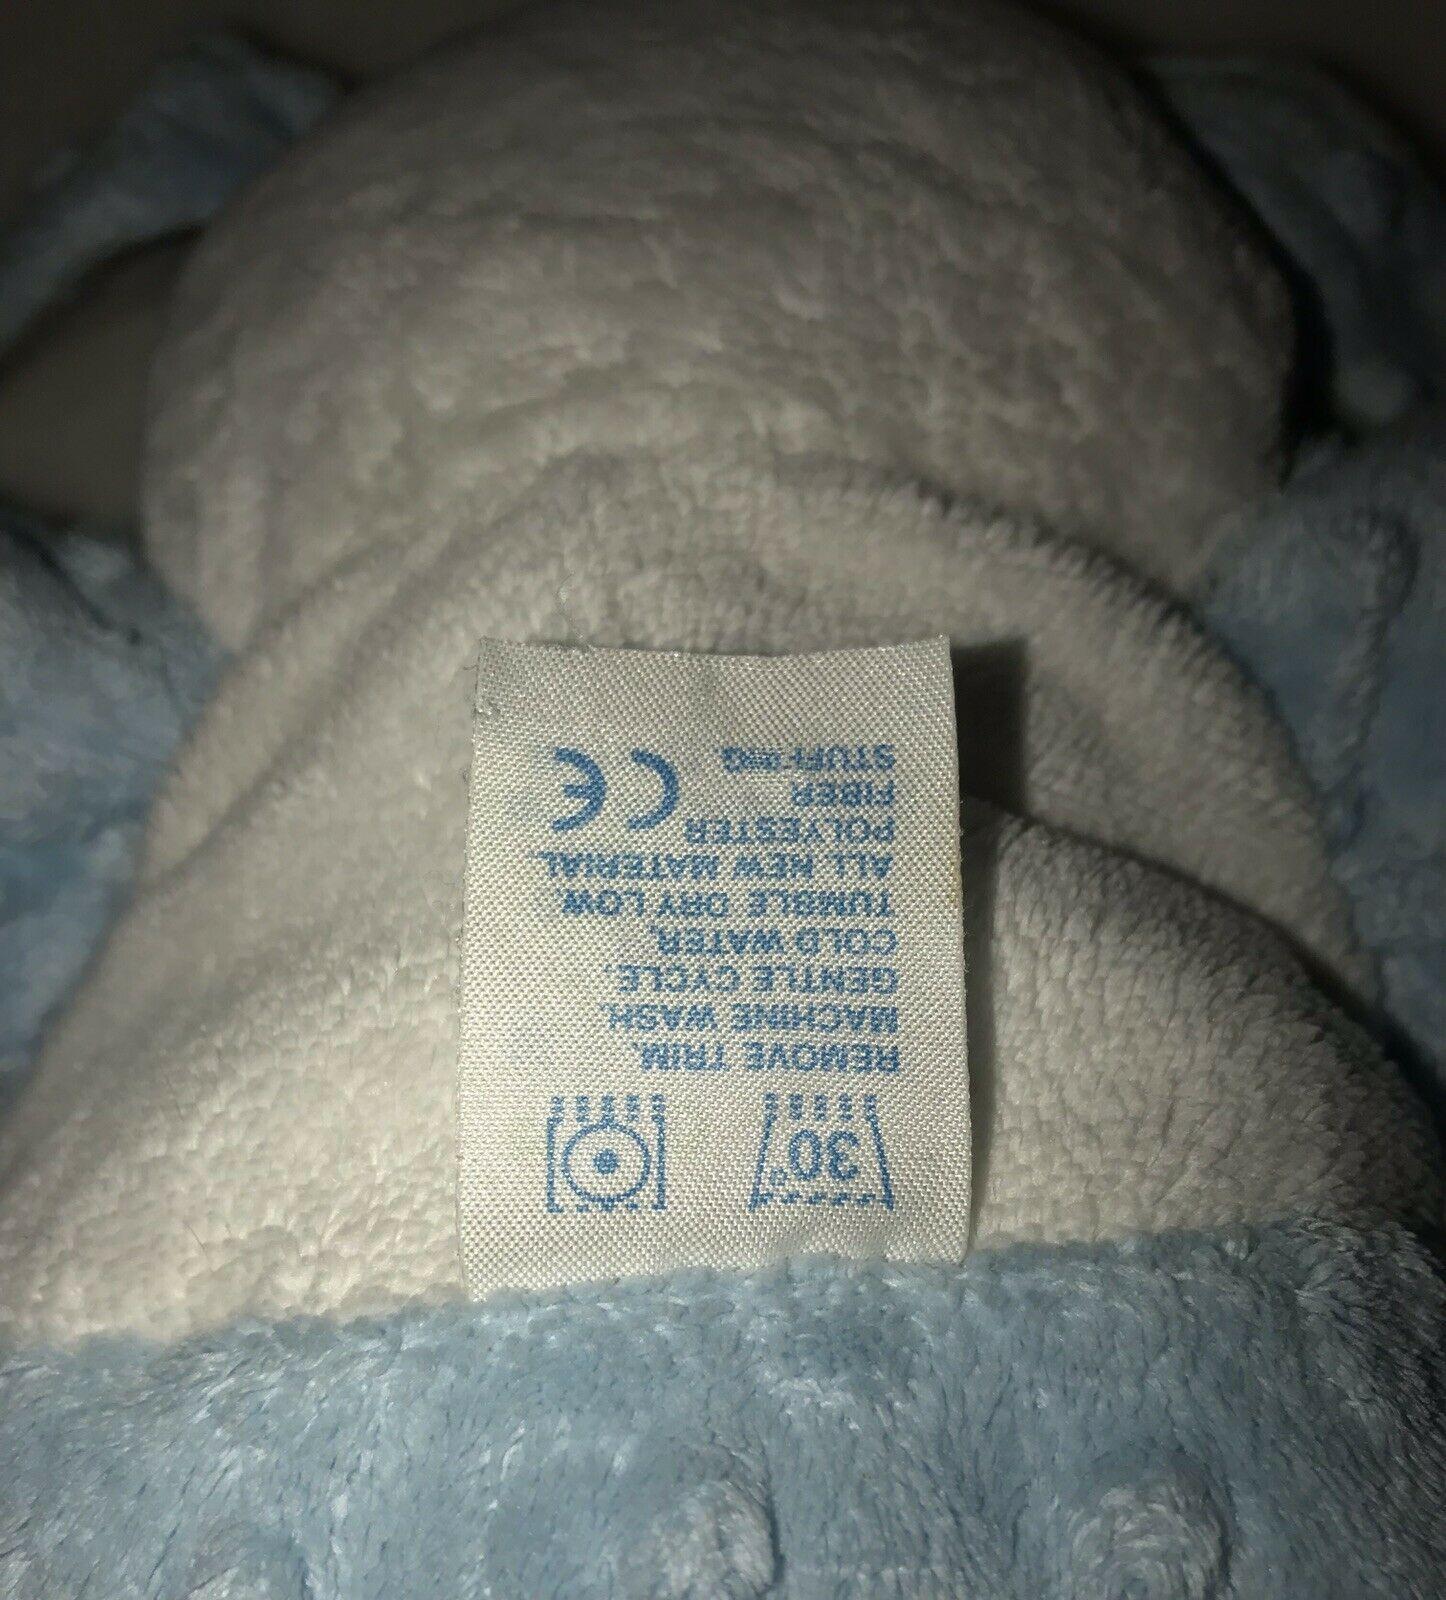 Kids Preferred Blue White So Cute Puppy Dog Minky Dot Plush Stuffed Baby Toy HTF image 3